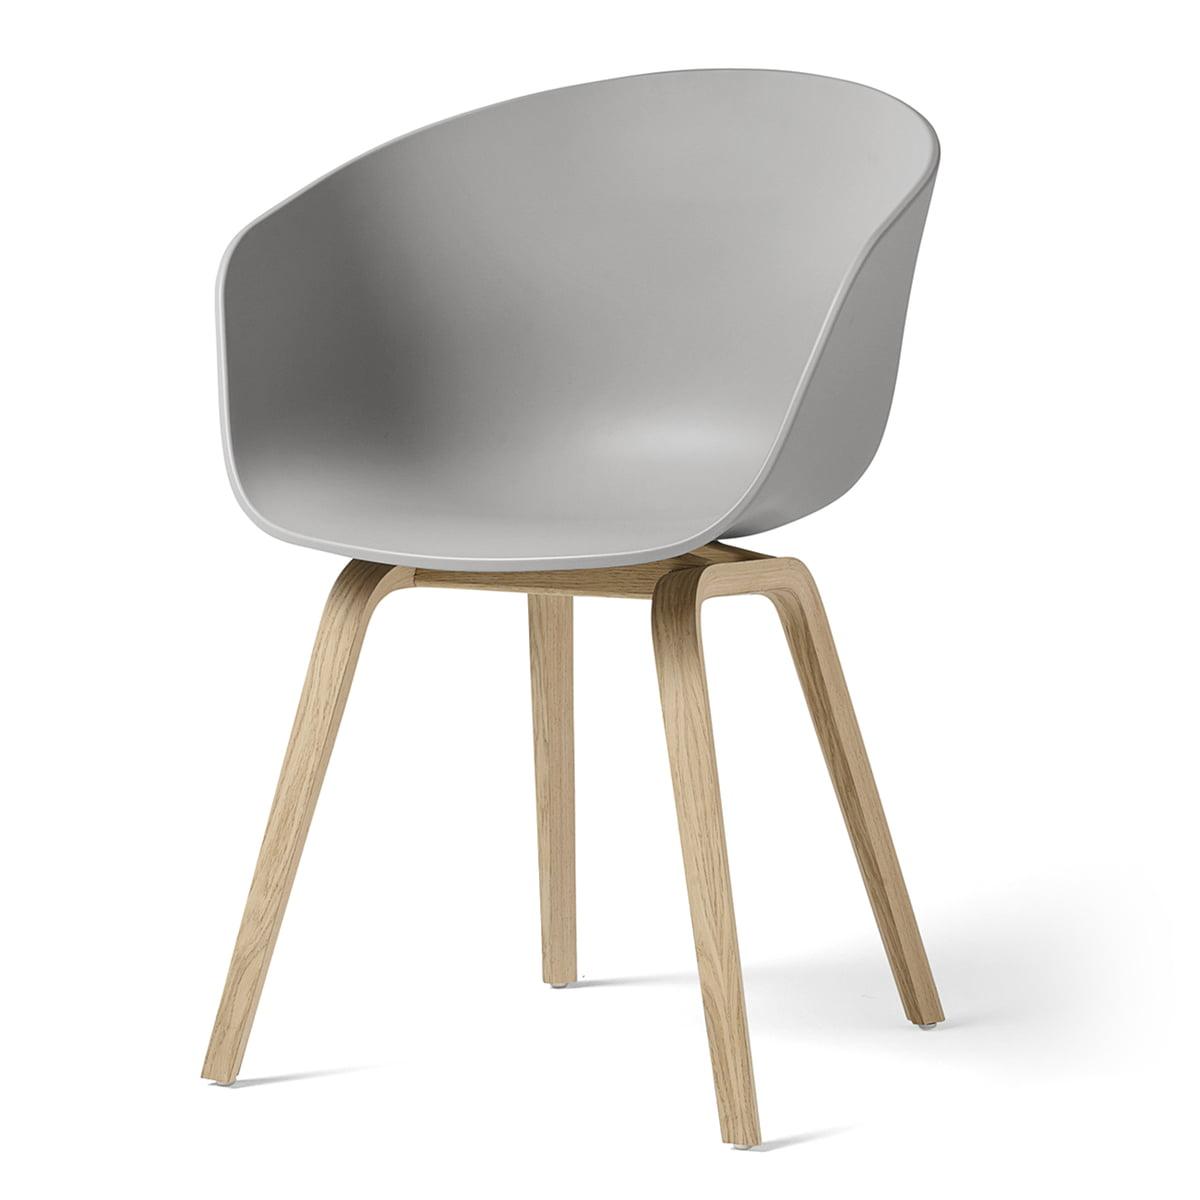 about a chair aac 22 eiche matt lackiert von hay. Black Bedroom Furniture Sets. Home Design Ideas